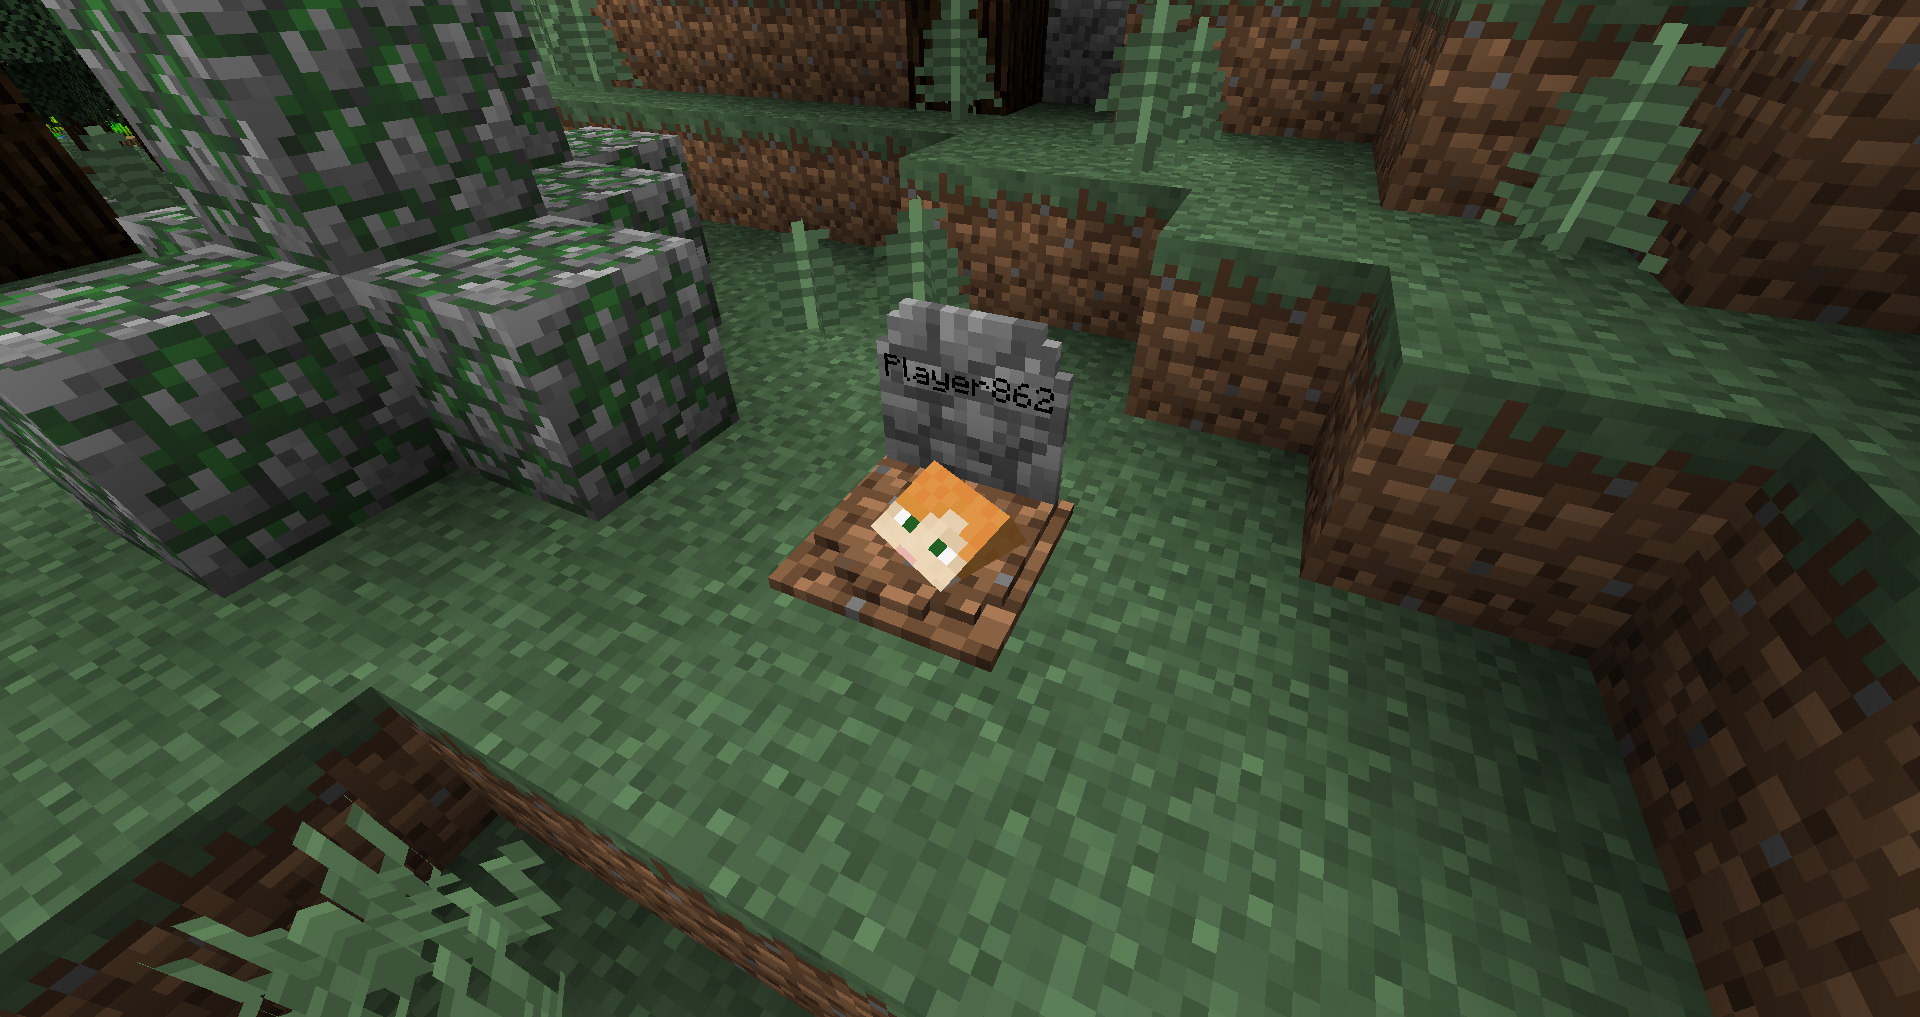 GraveStone Mod - Mods - Minecraft - CurseForge